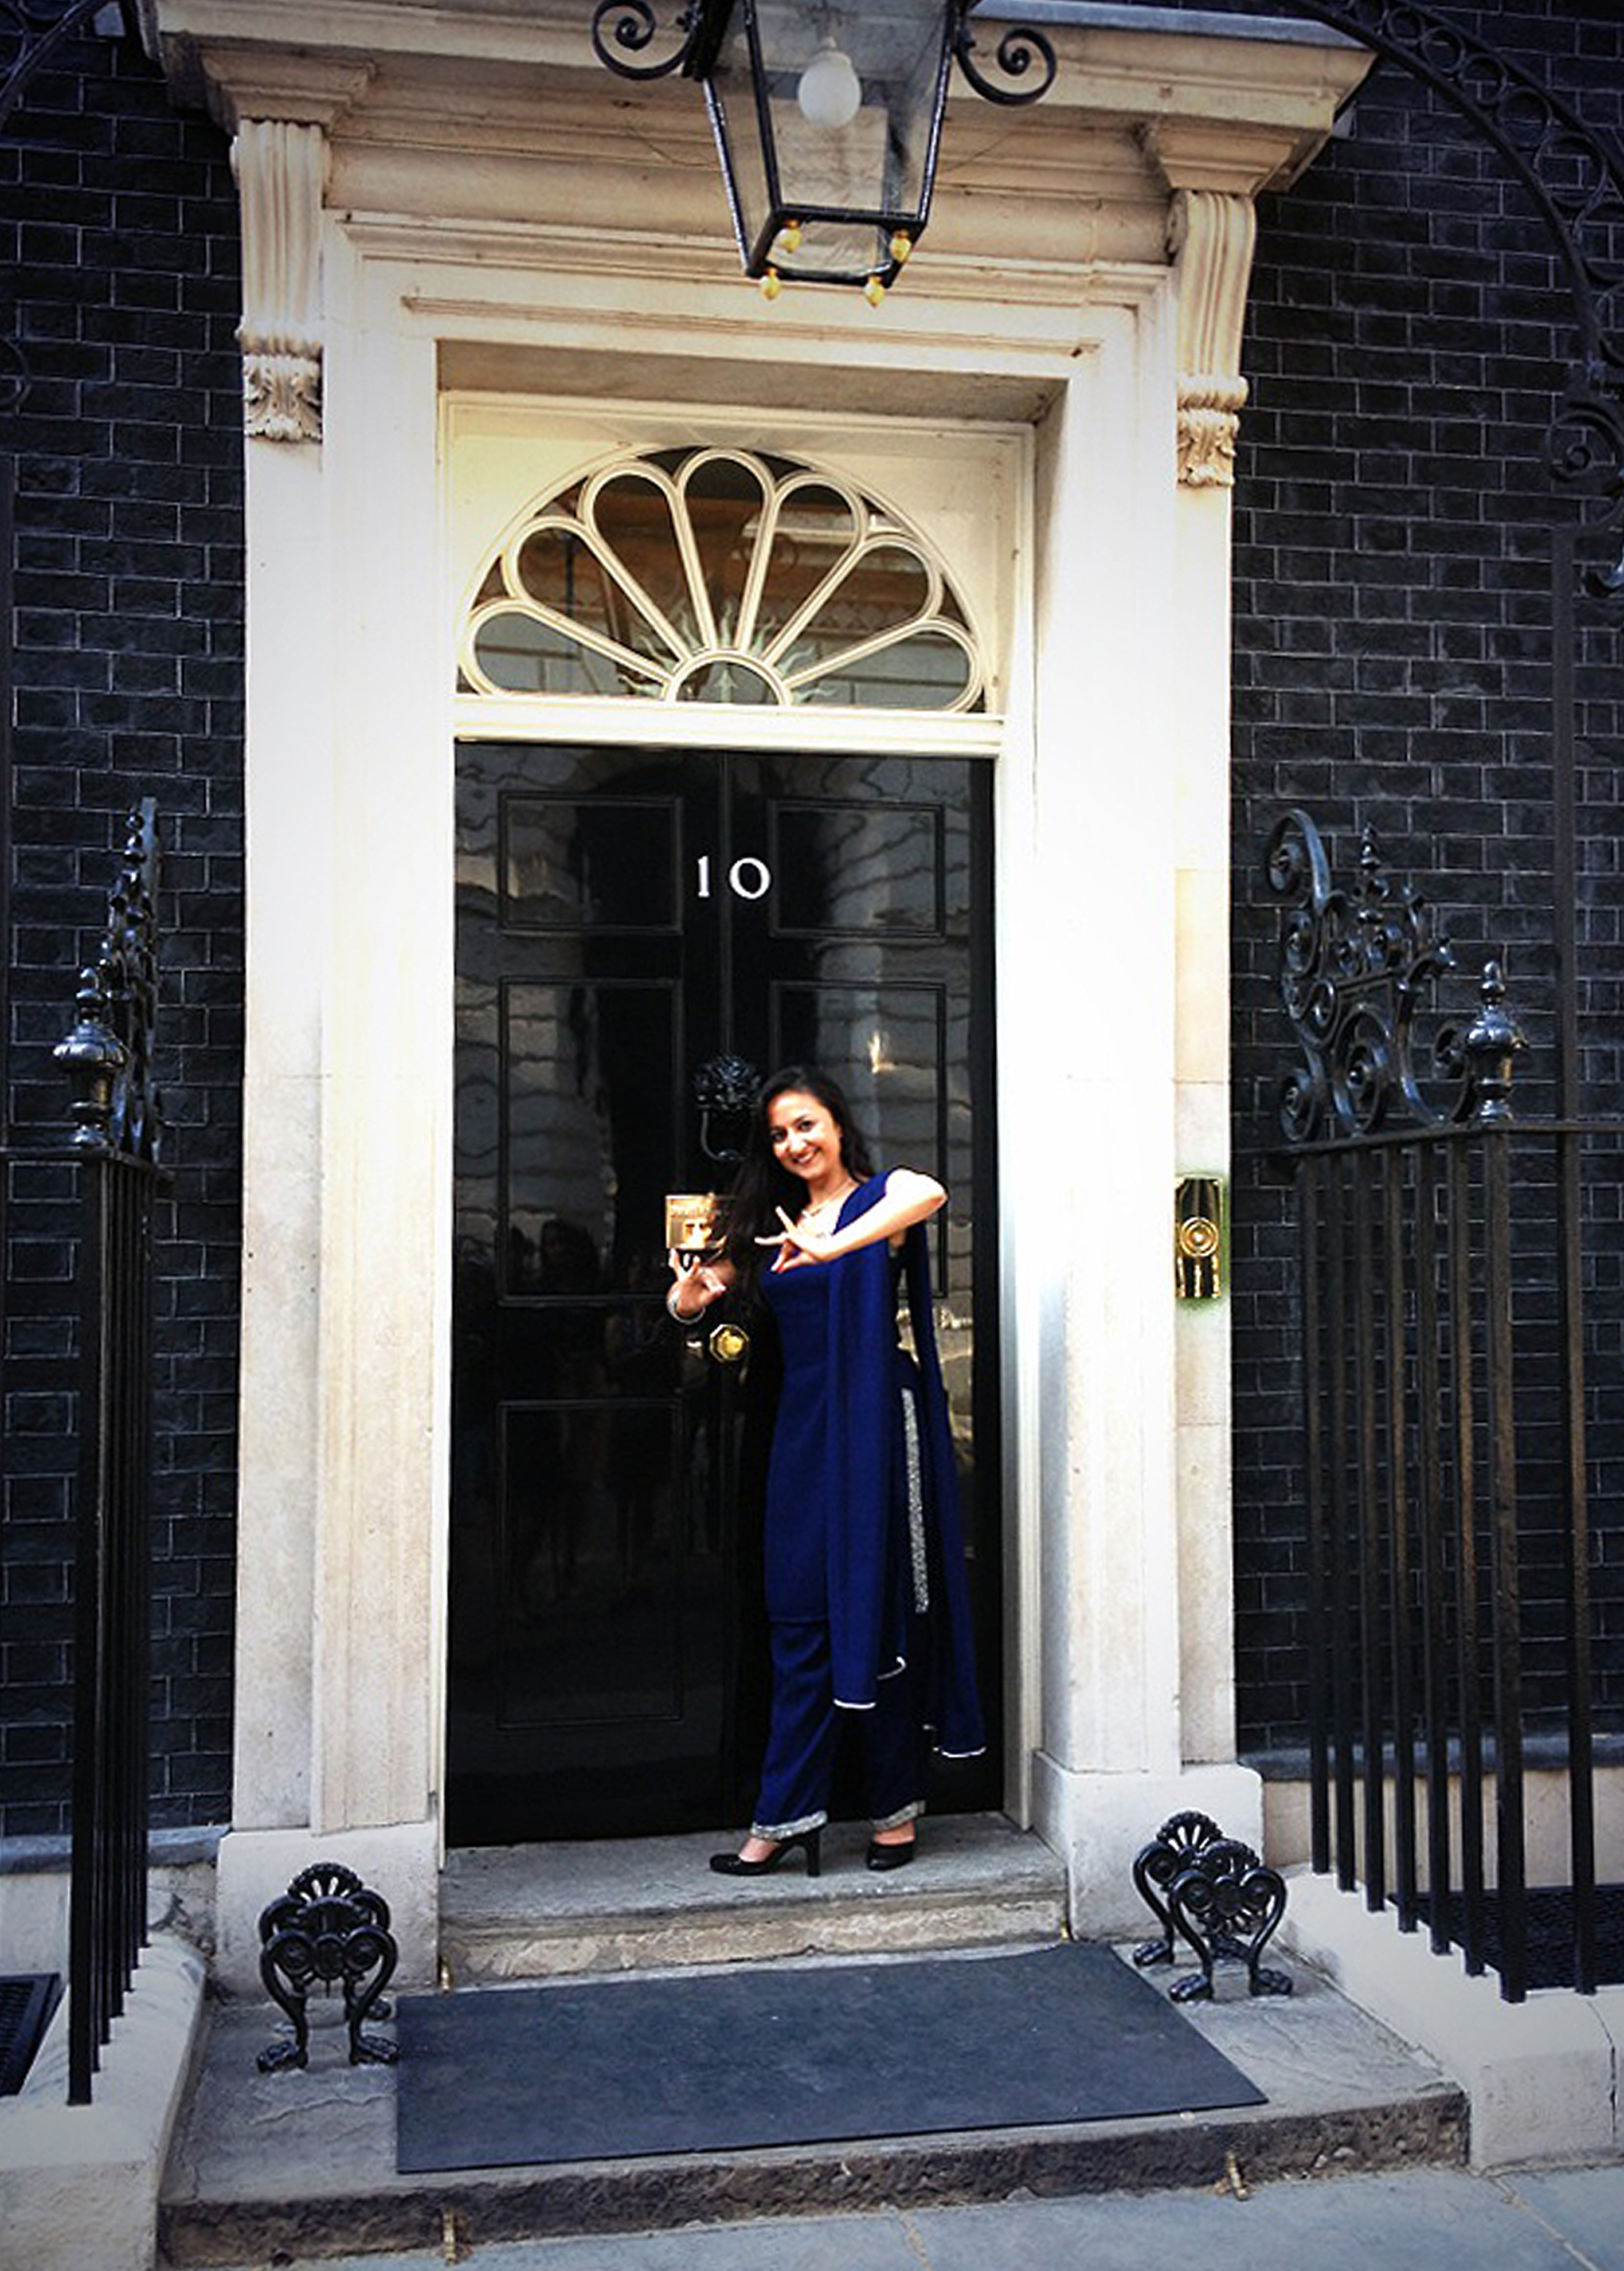 Inside No 10 Downing Street Just Jhoom